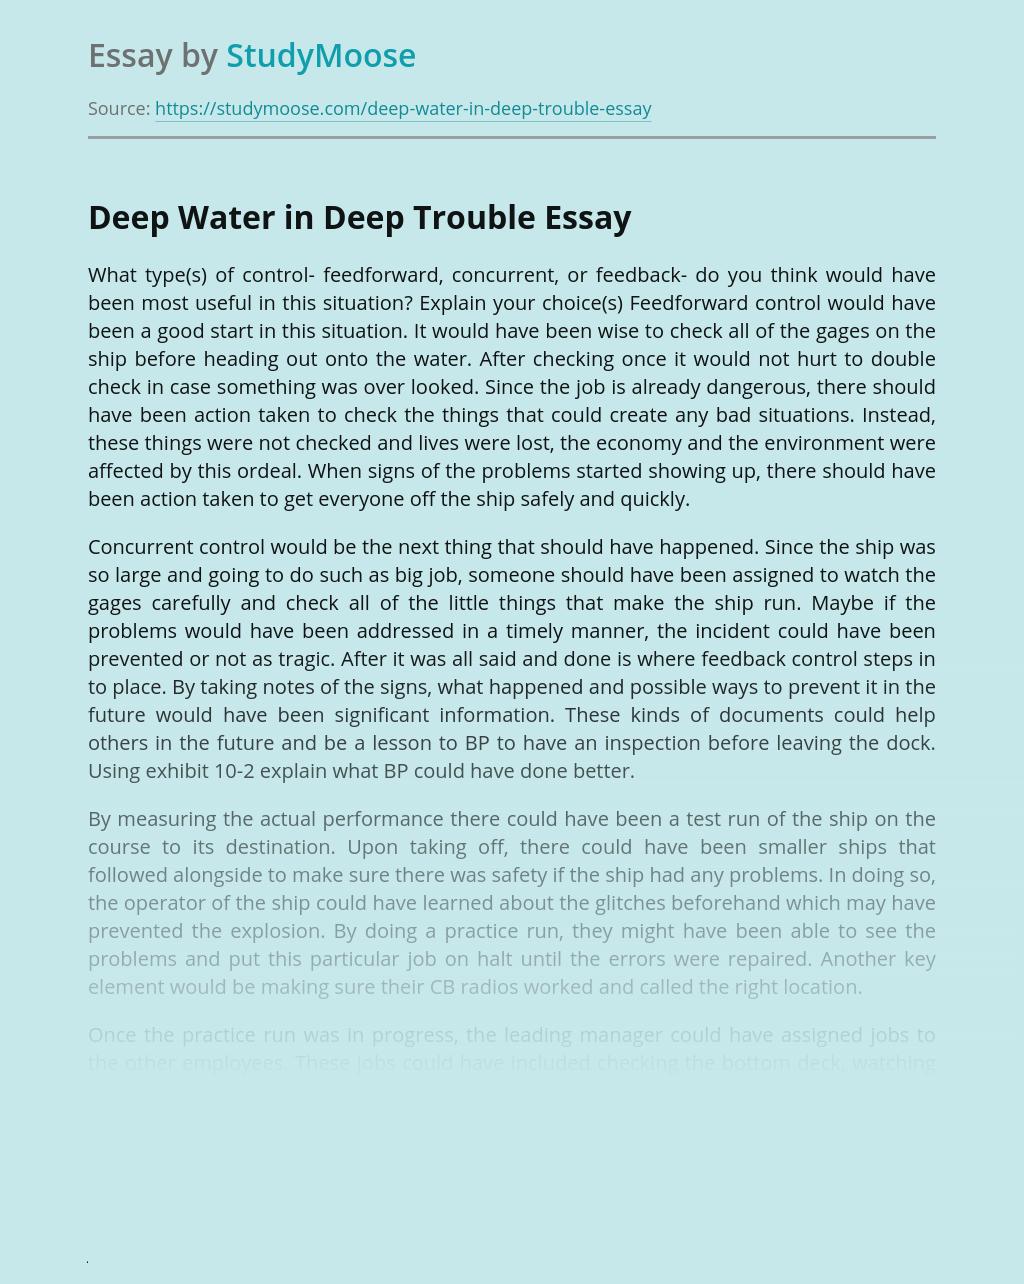 Deep Water in Deep Trouble